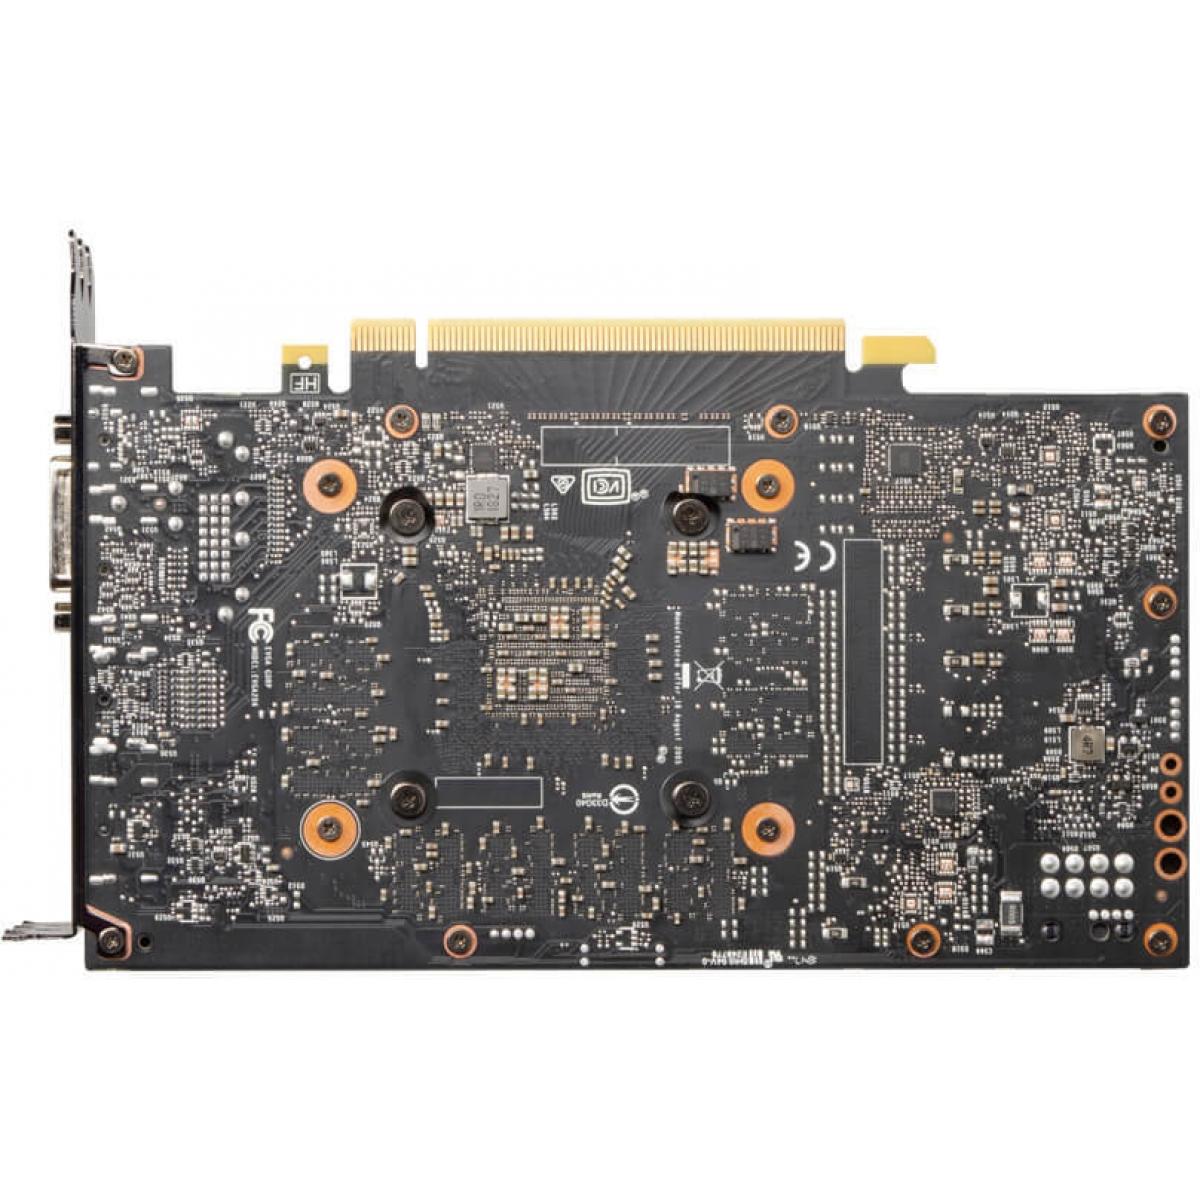 Placa de Vídeo EVGA Geforce RTX 2060 XC Black, 6GB GDDR6, 192Bit, 06G-P4-2061-KR